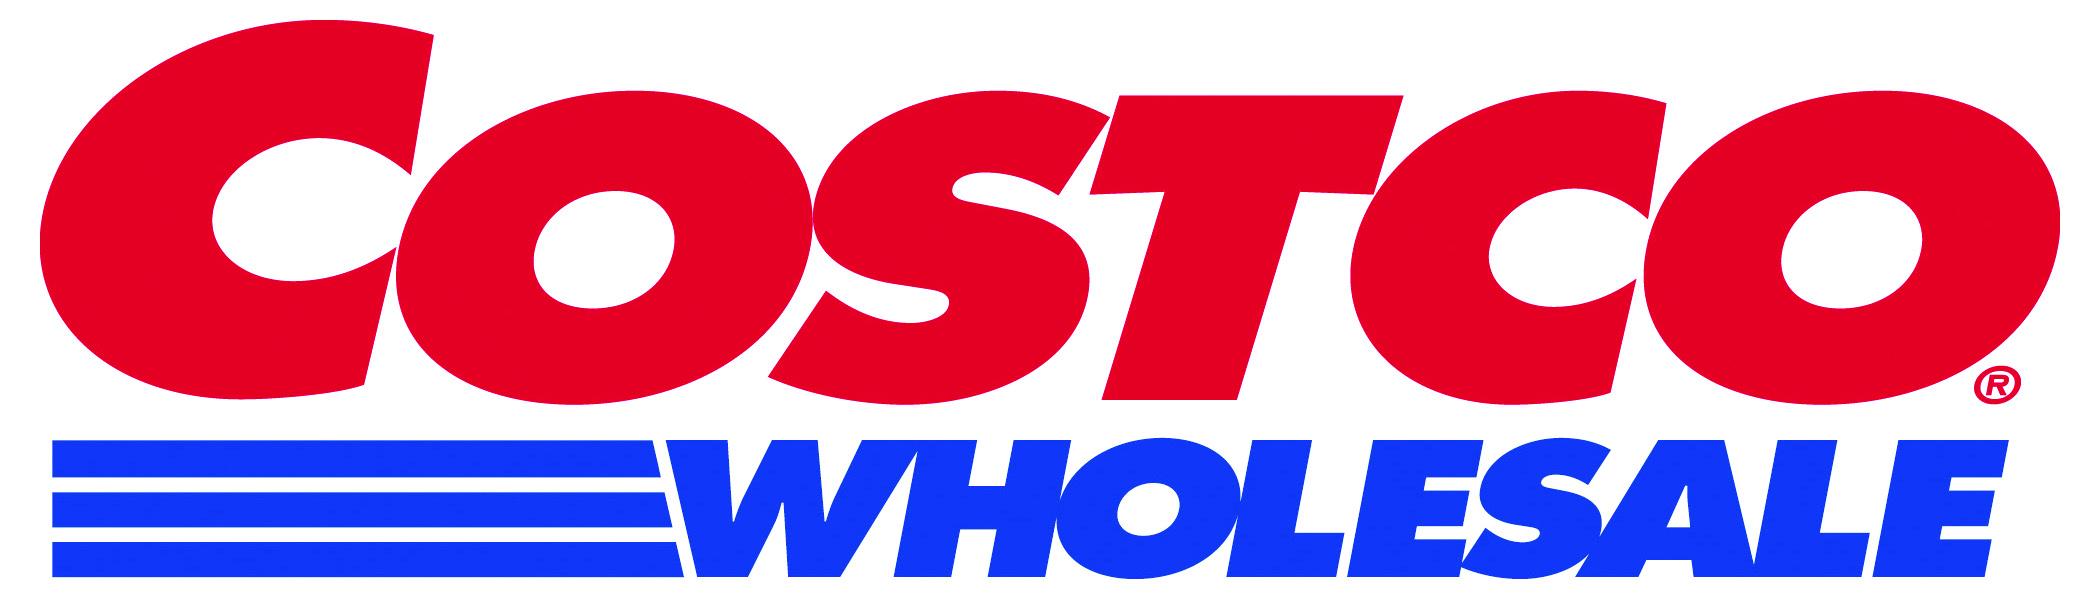 Costco - Marketplace Sponsor